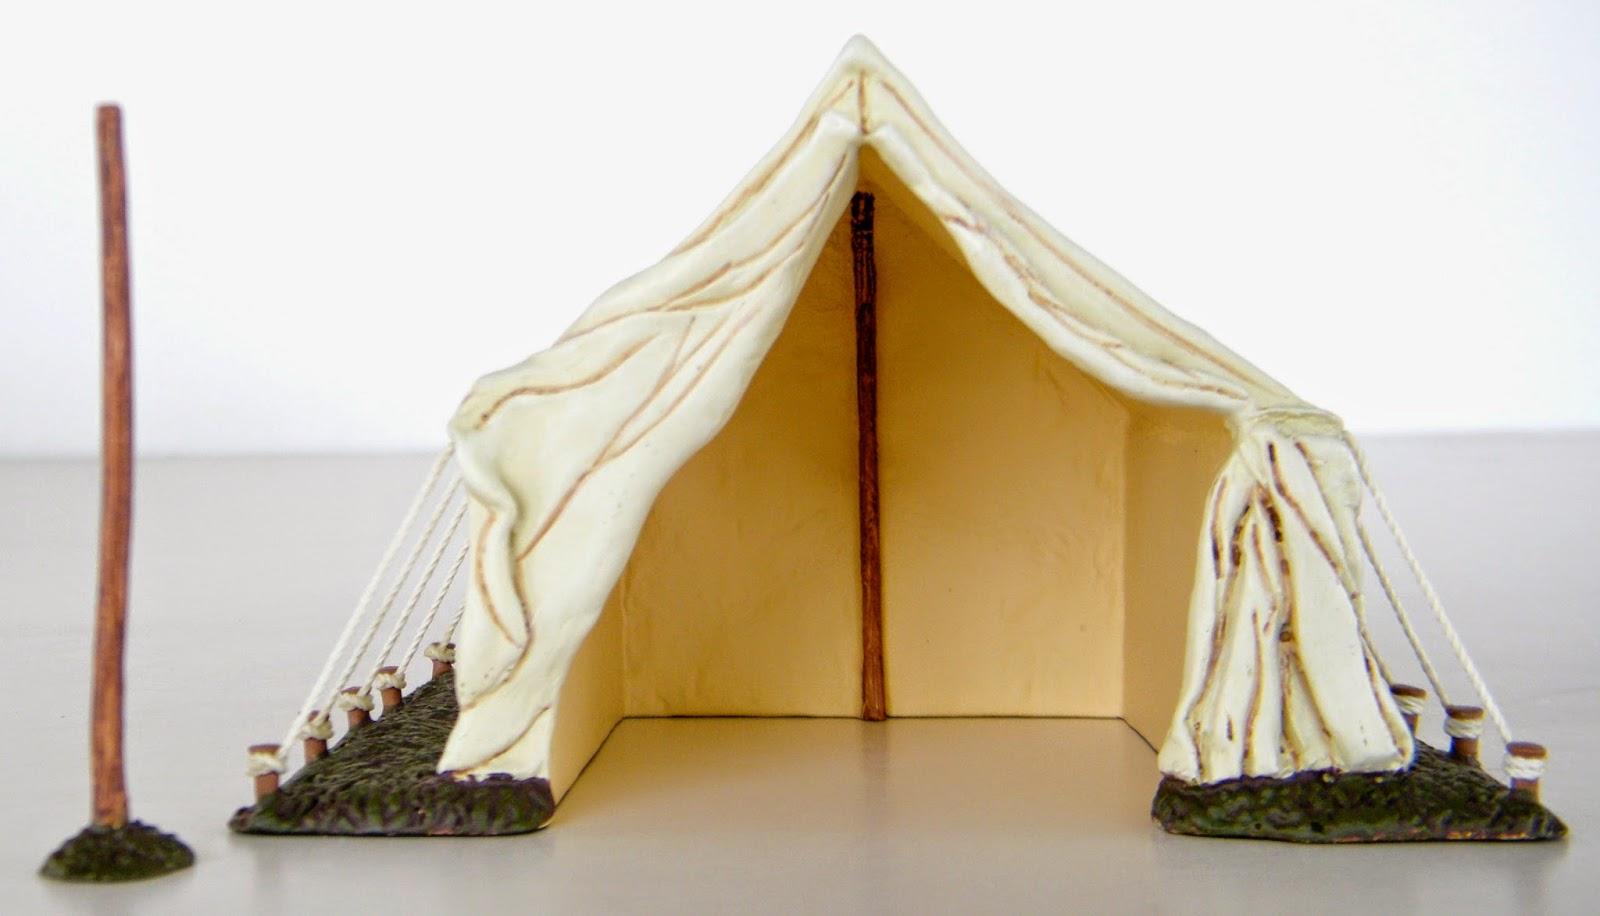 Civil War Tents : Toys and stuff wm britains civil war tents